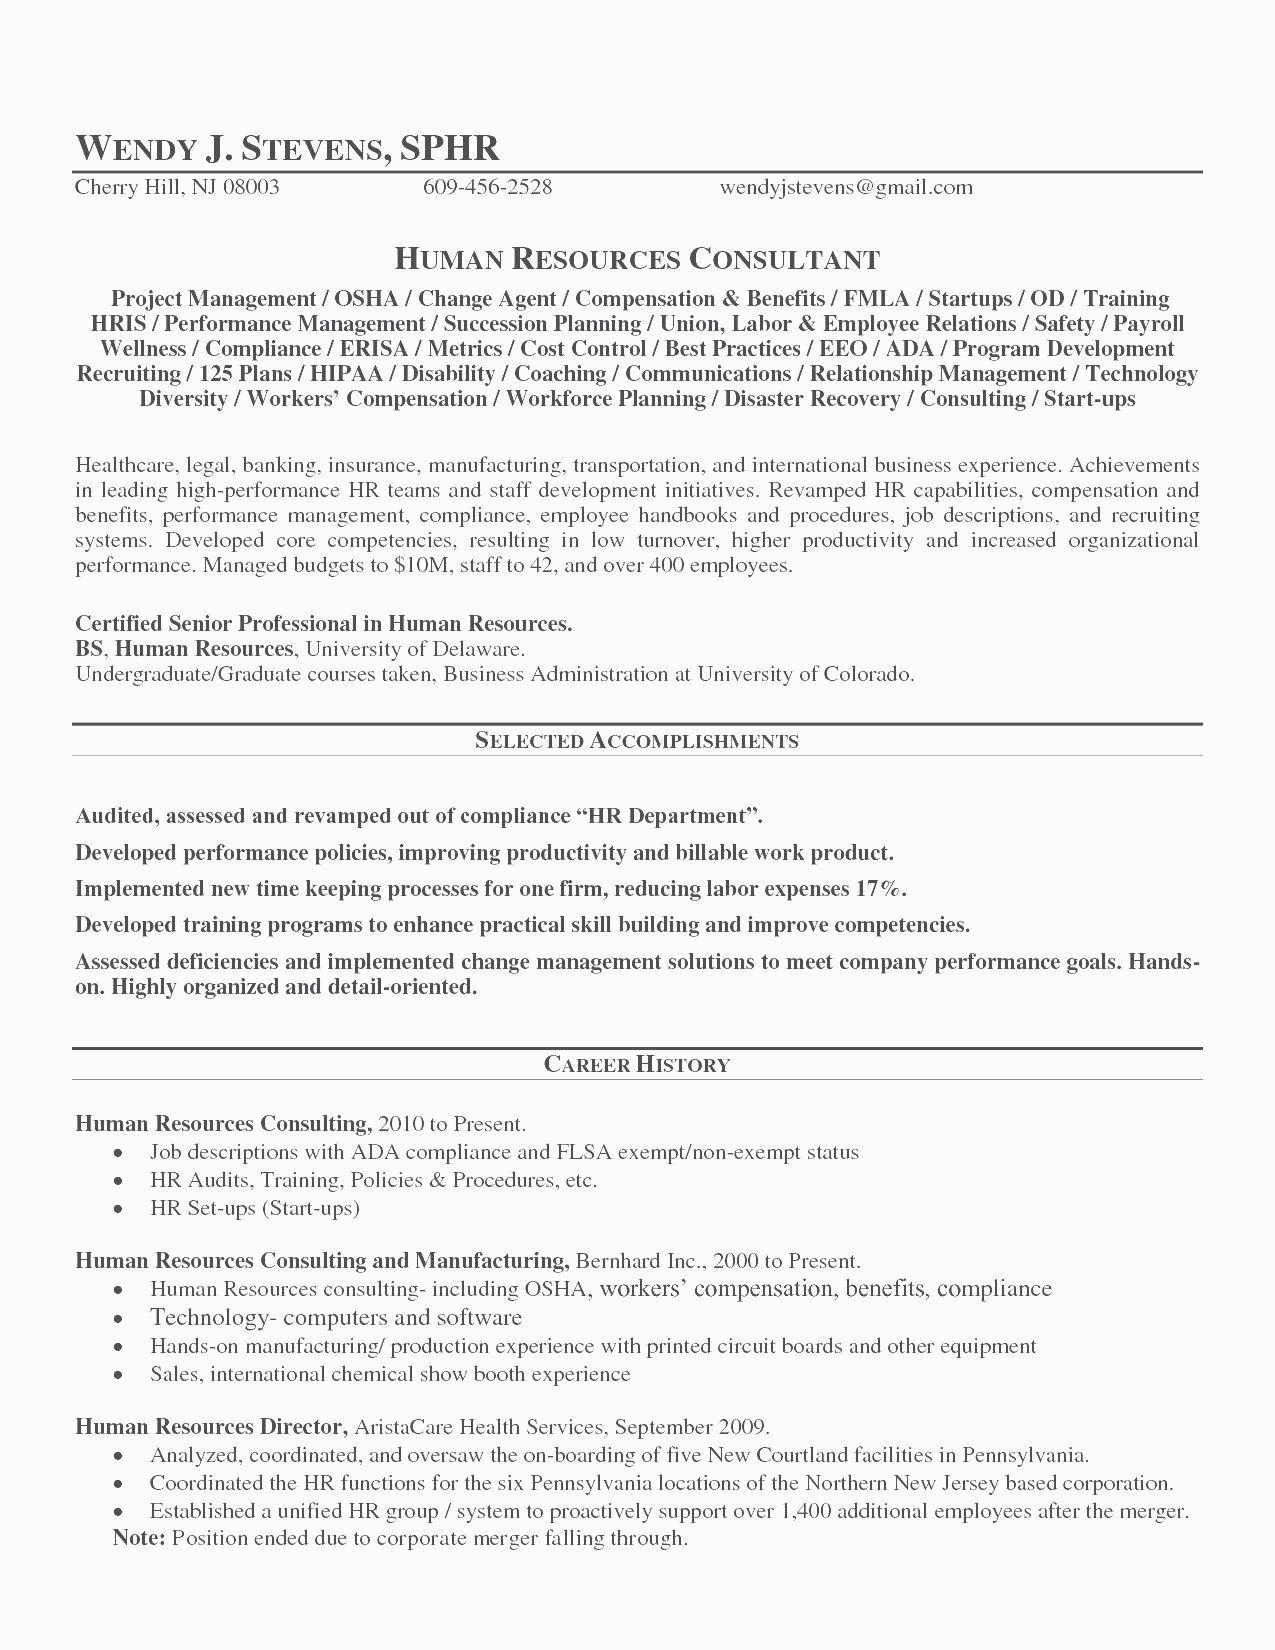 Business Owner Job Description For Resume Best Of 92 Residential Property Manager Resume Sample Residential